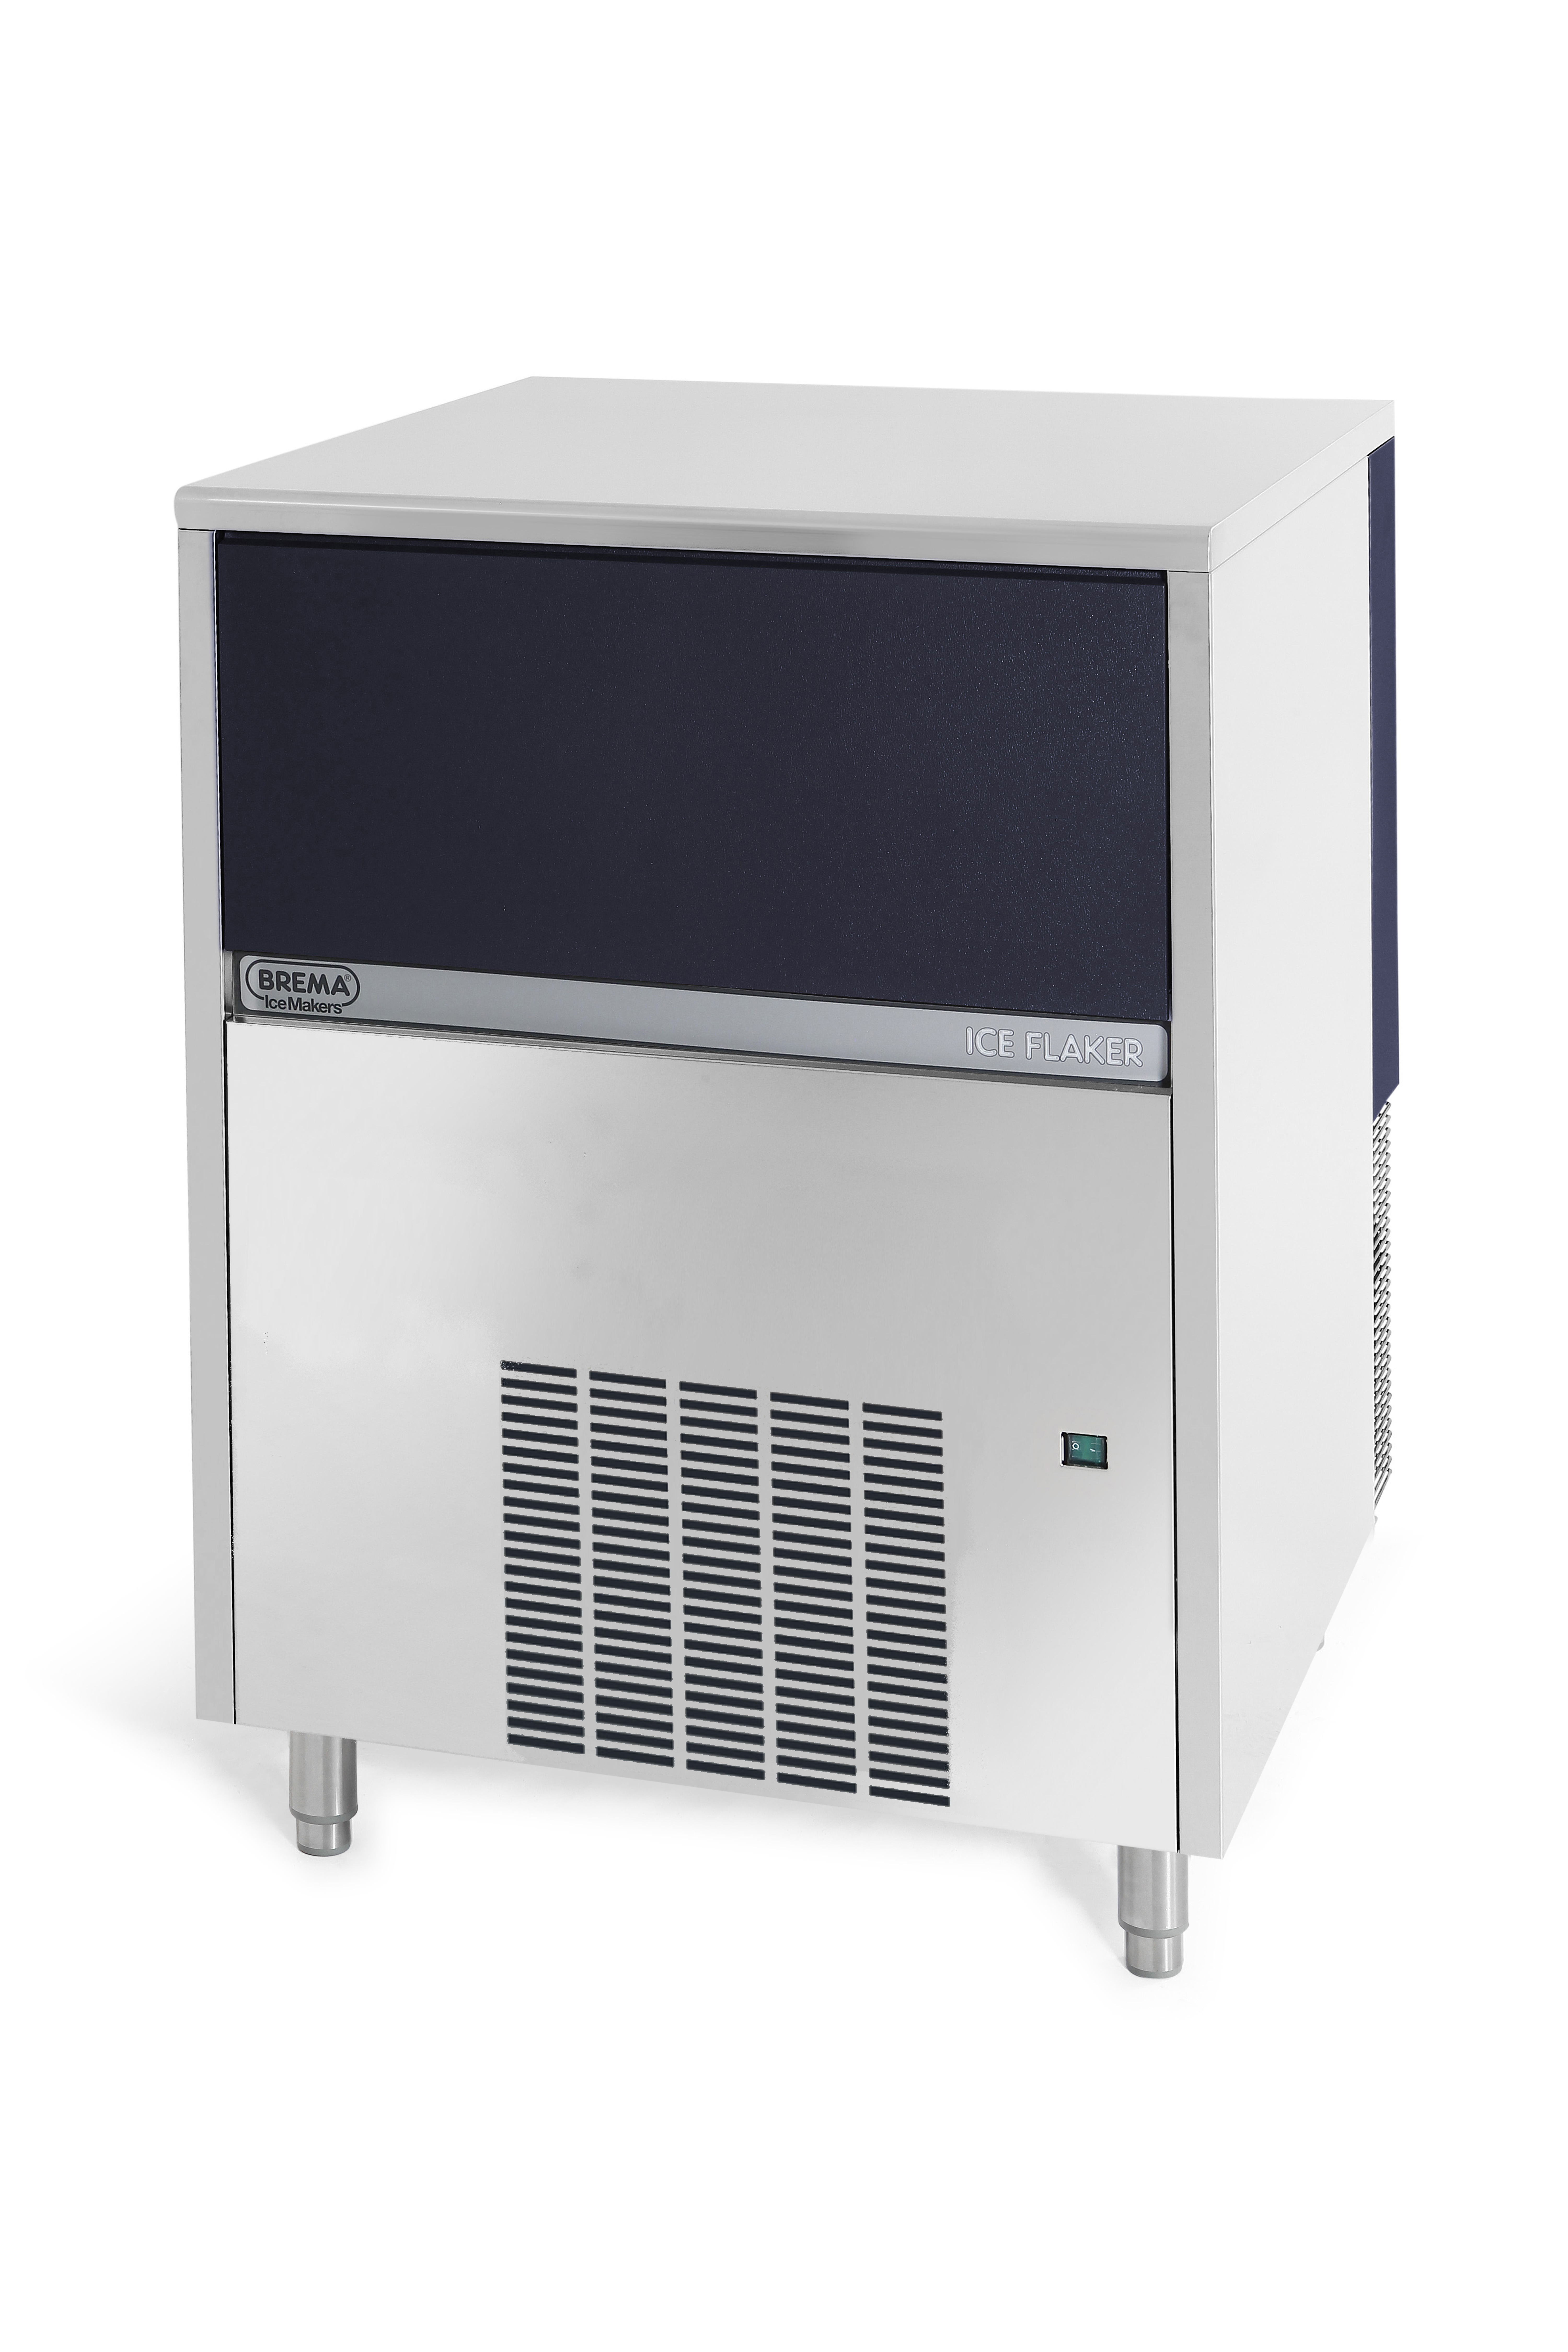 Eurodib USA GB1504A HC ice makers